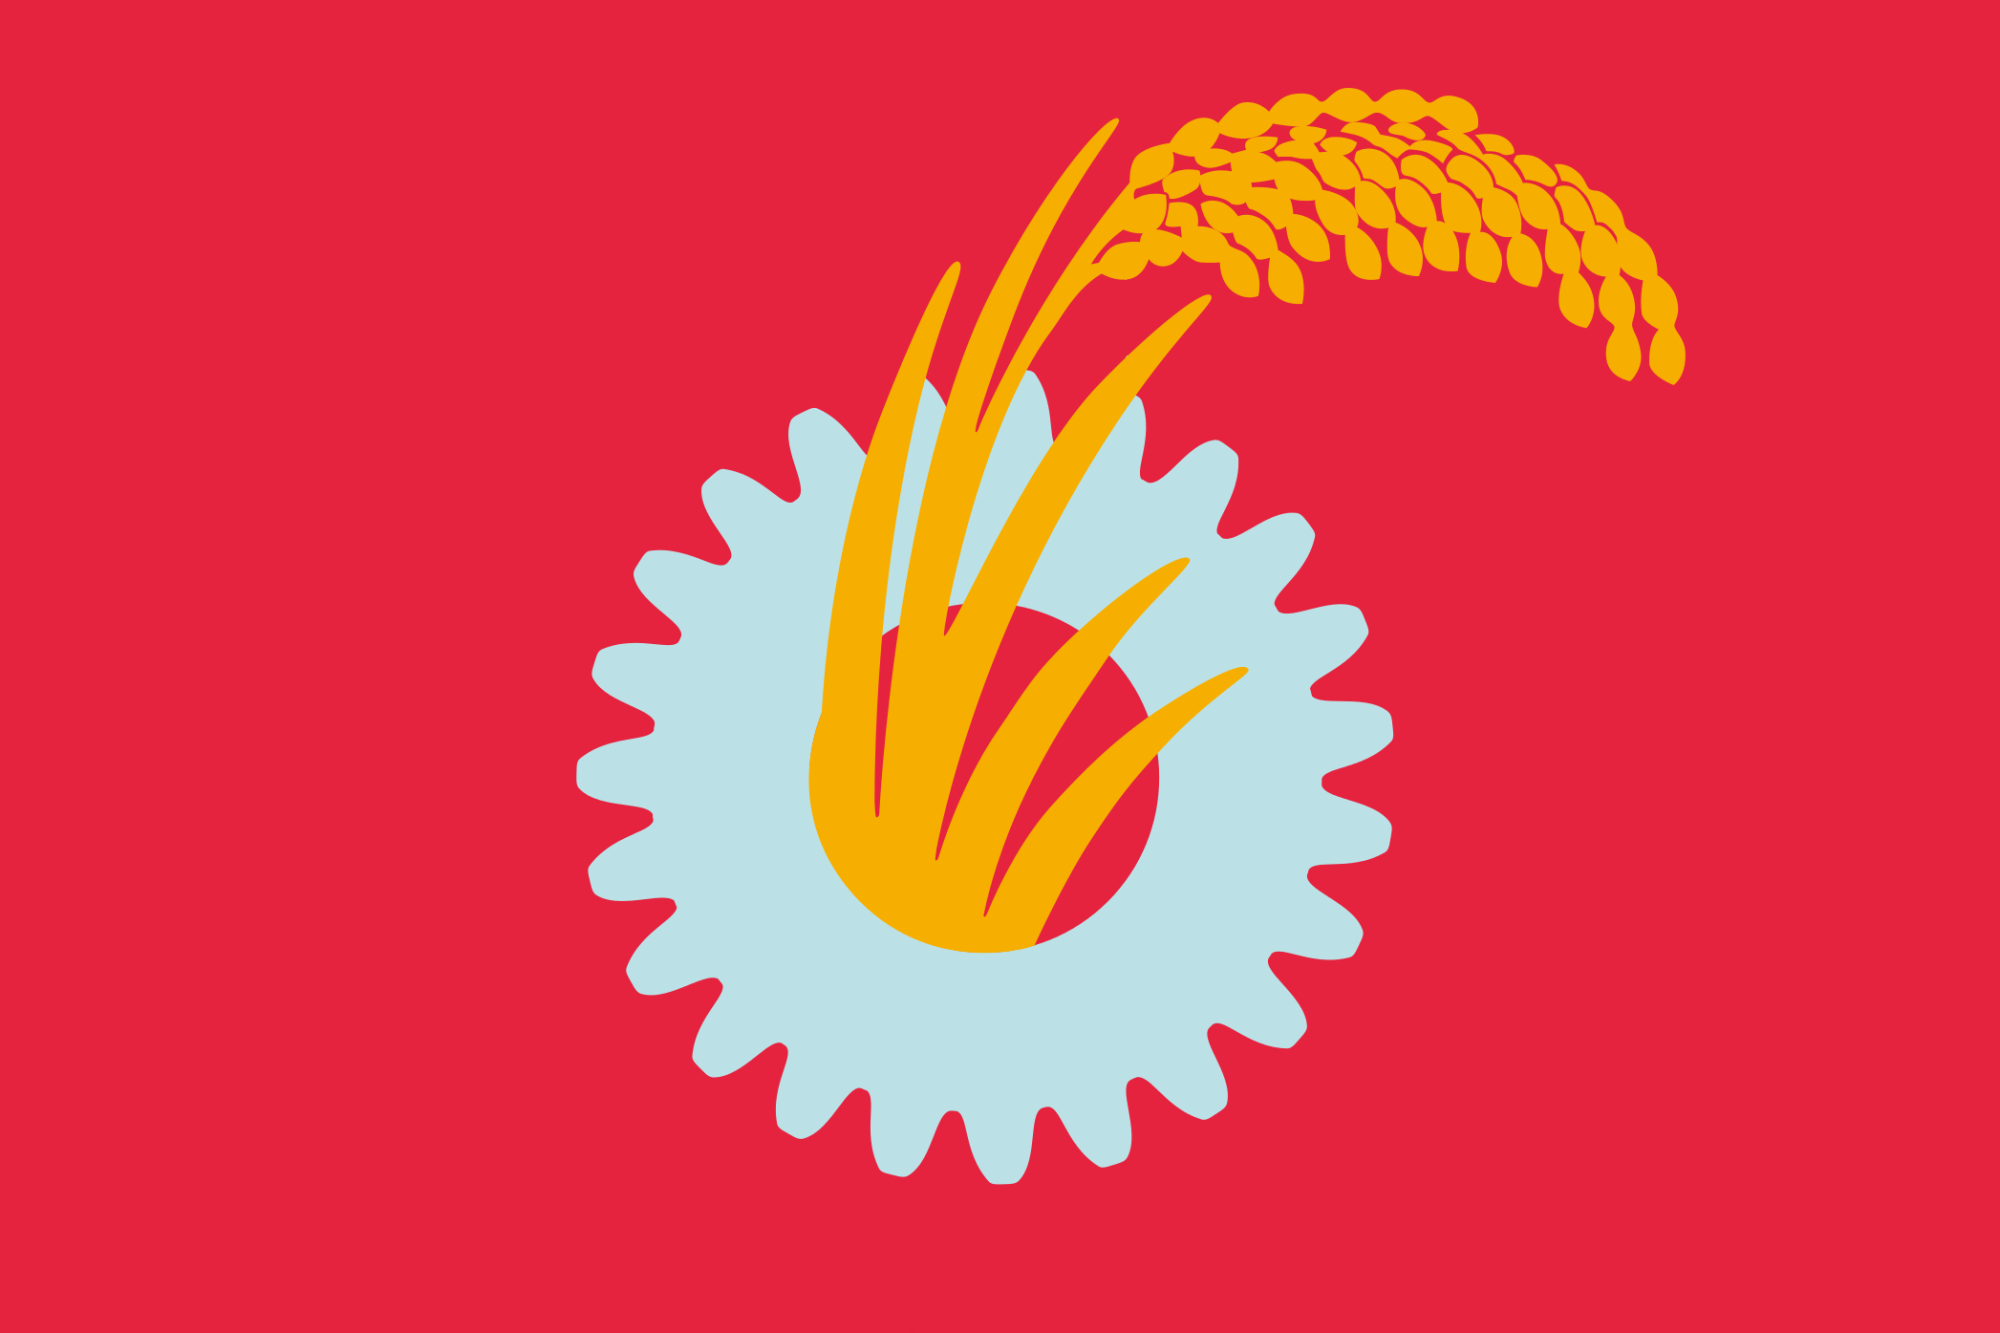 Dailyradical History On Twitter In 2021 Flag Art Japan Flag Alternate History Flags